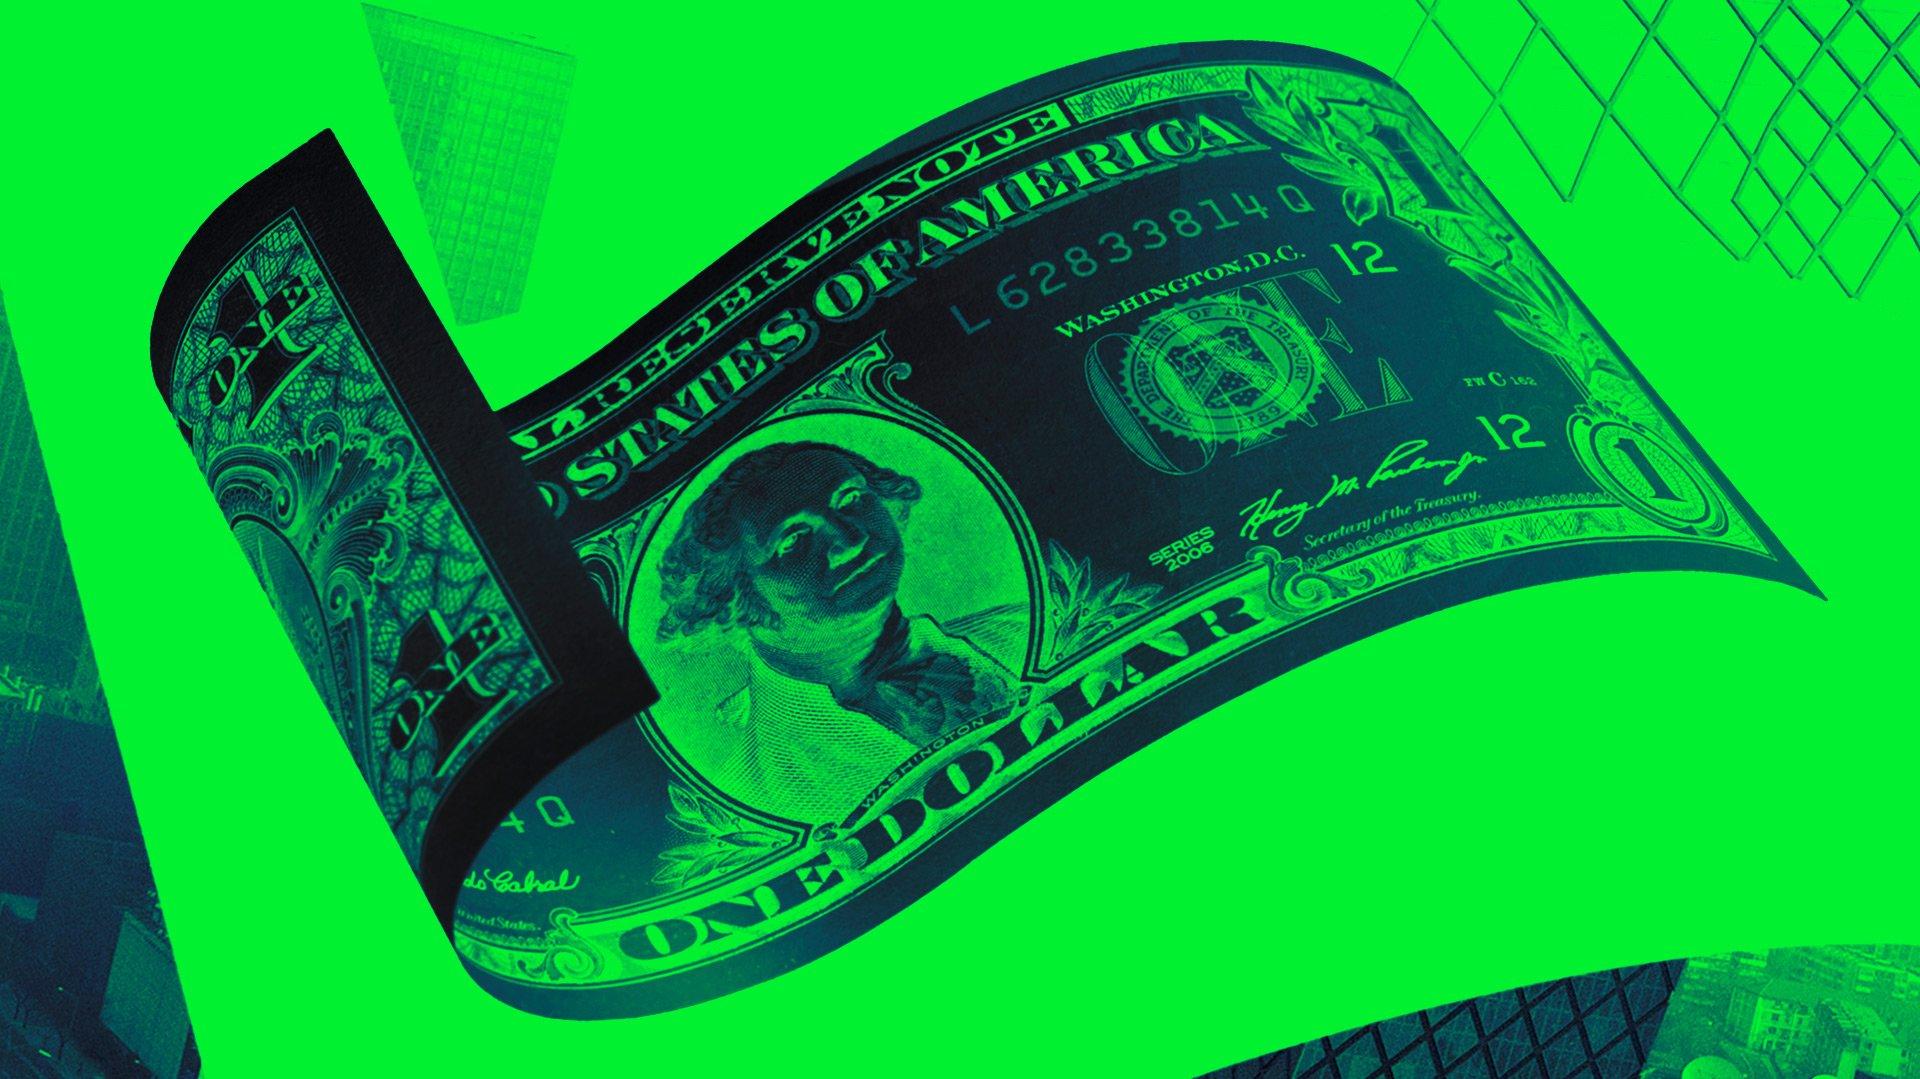 DeFi lending platform Maple Finance debuts with its inaugural $17 million pool